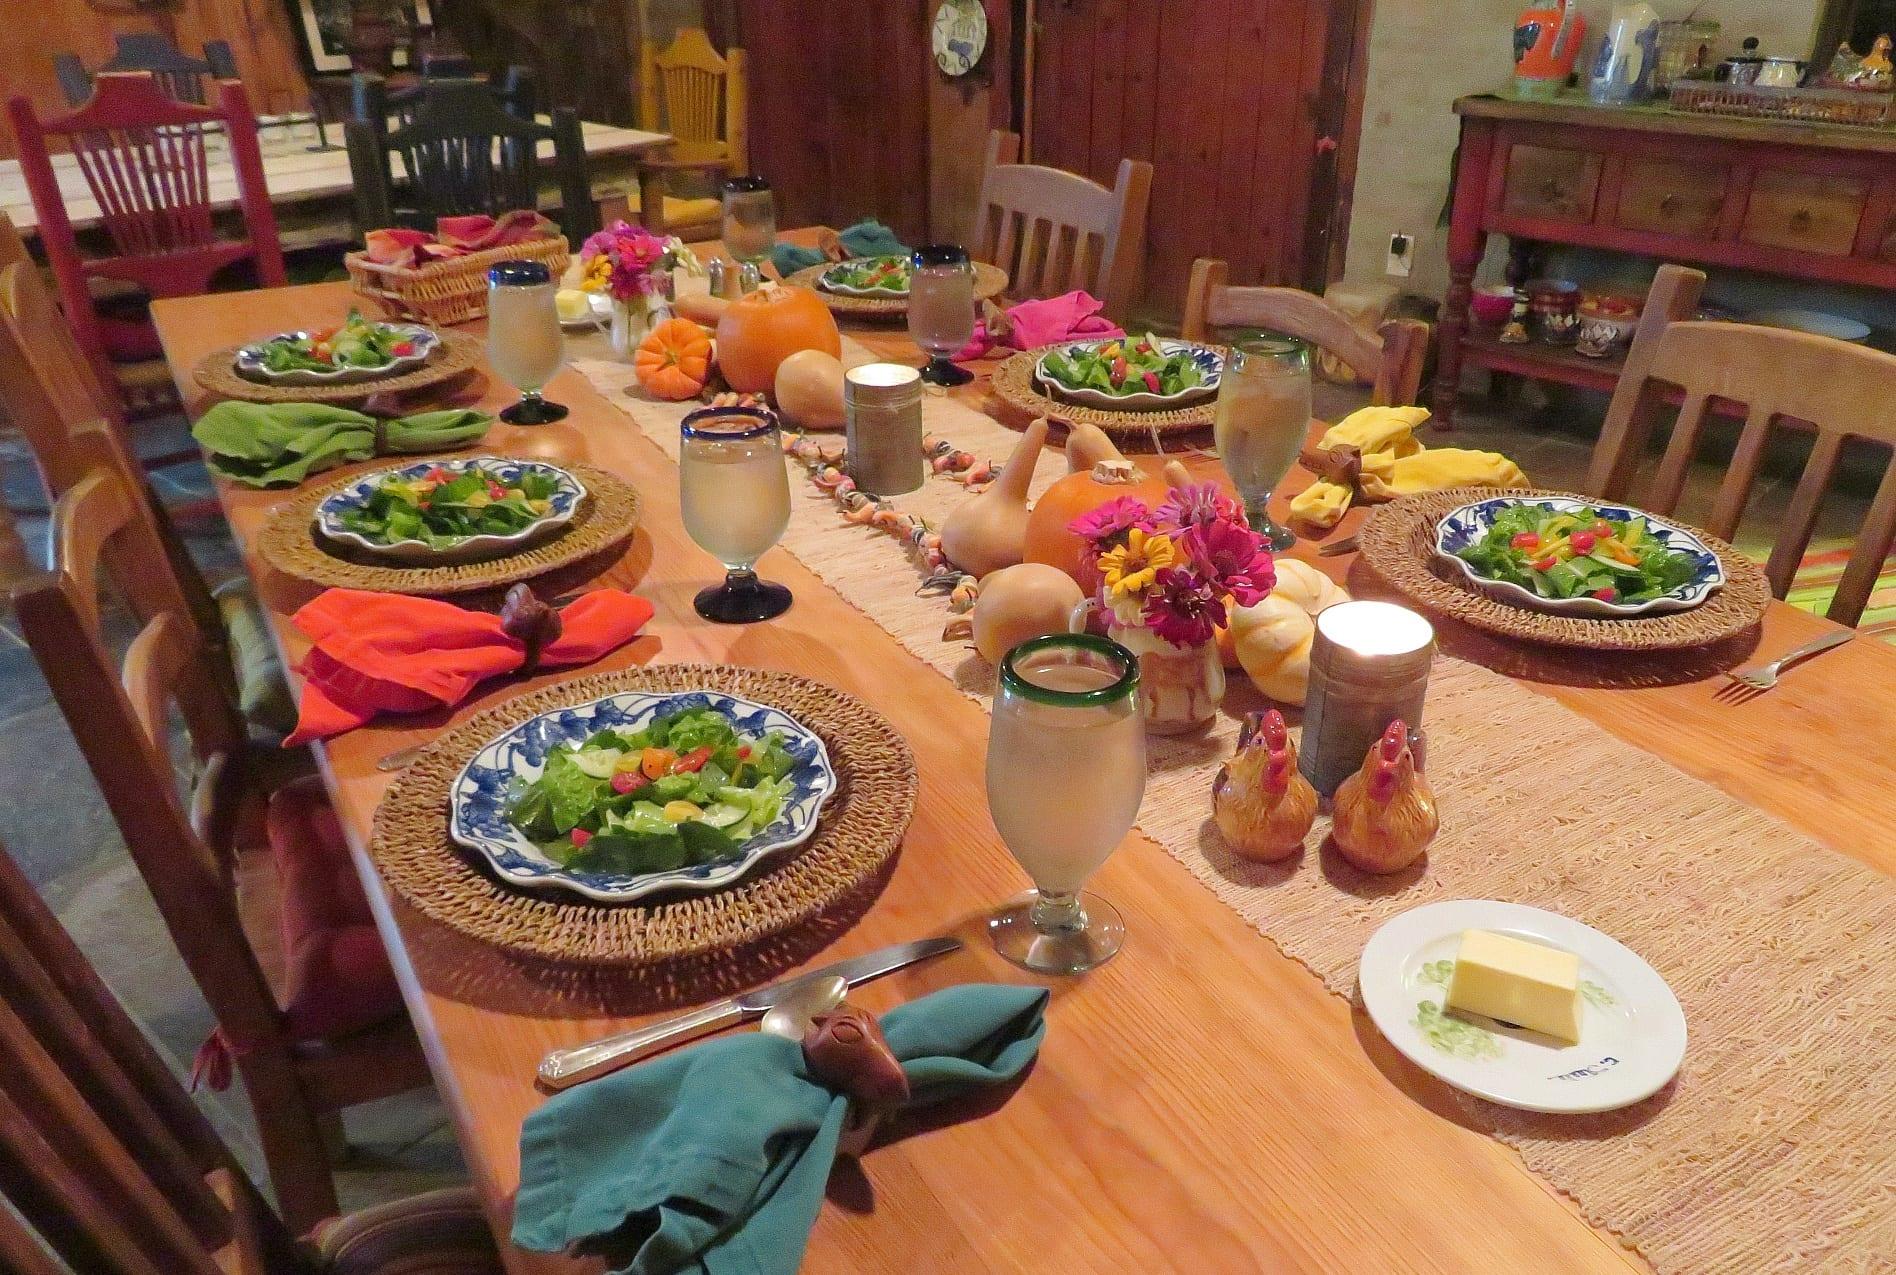 Enjoy three-course, farm-to-table meals at Aravaipa Farms Inn